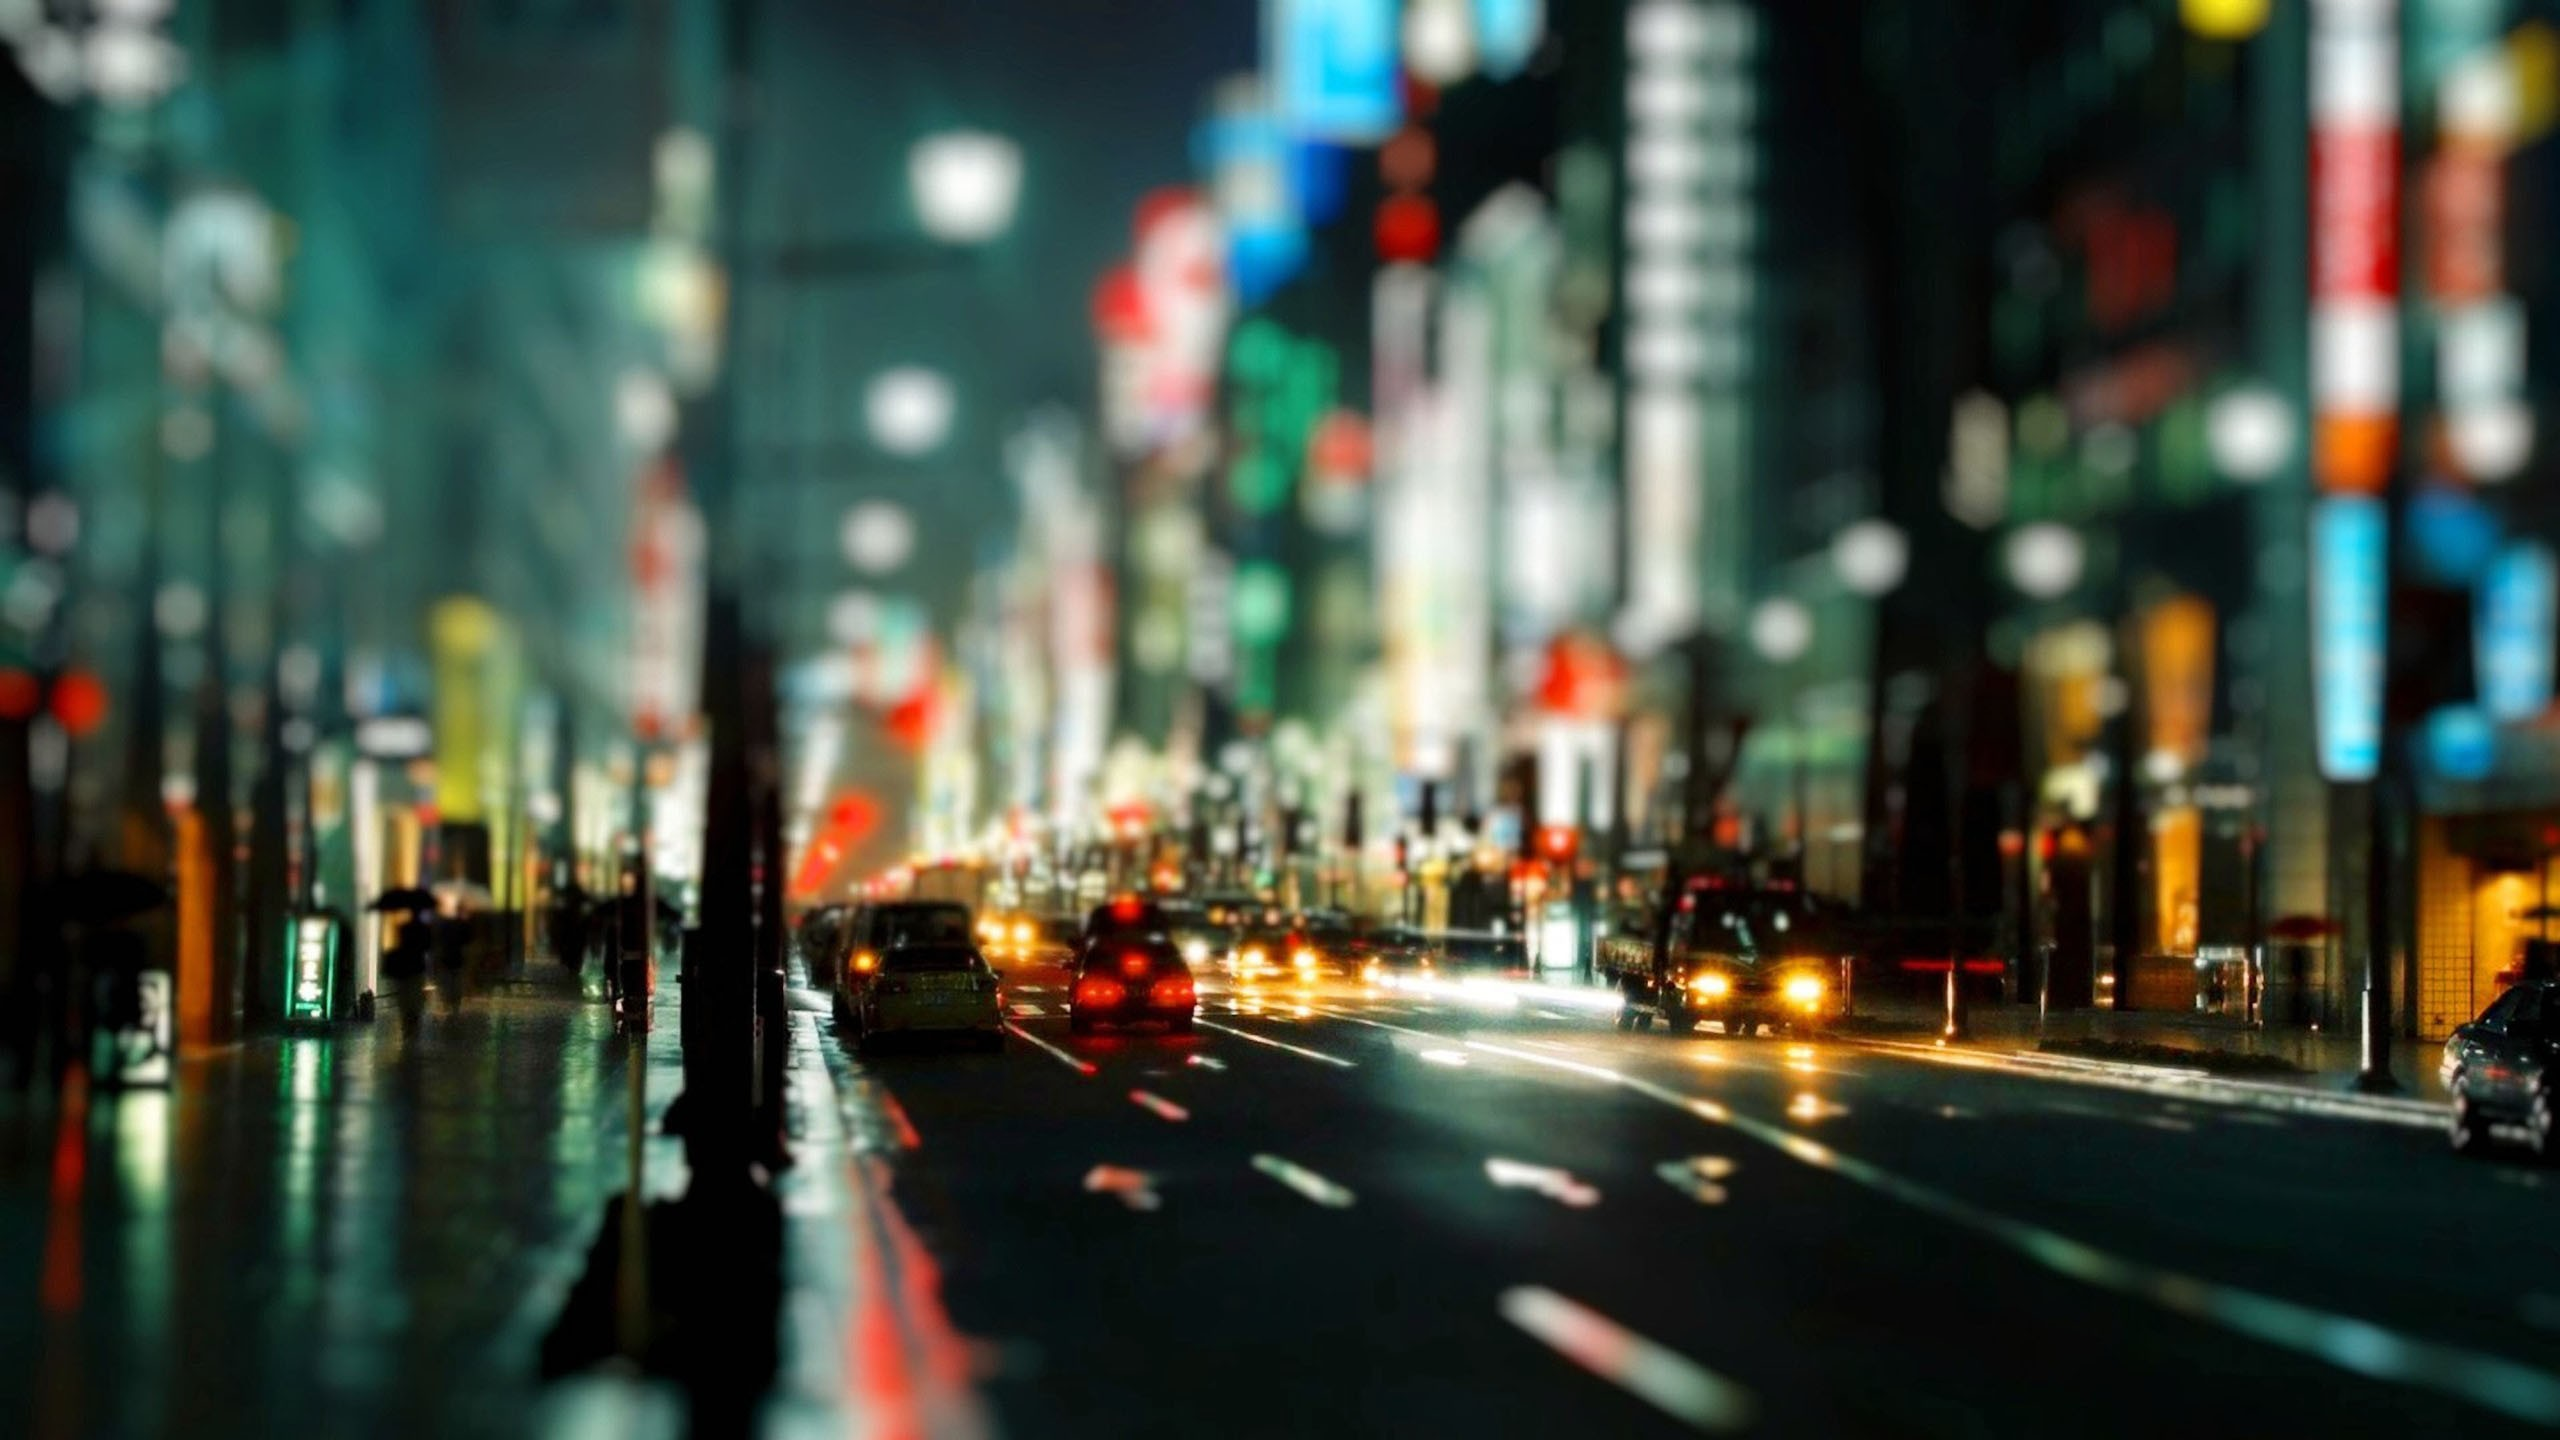 Download Wallpaper cityscapes streets night traffic bokeh city lights tilt shift -183-32